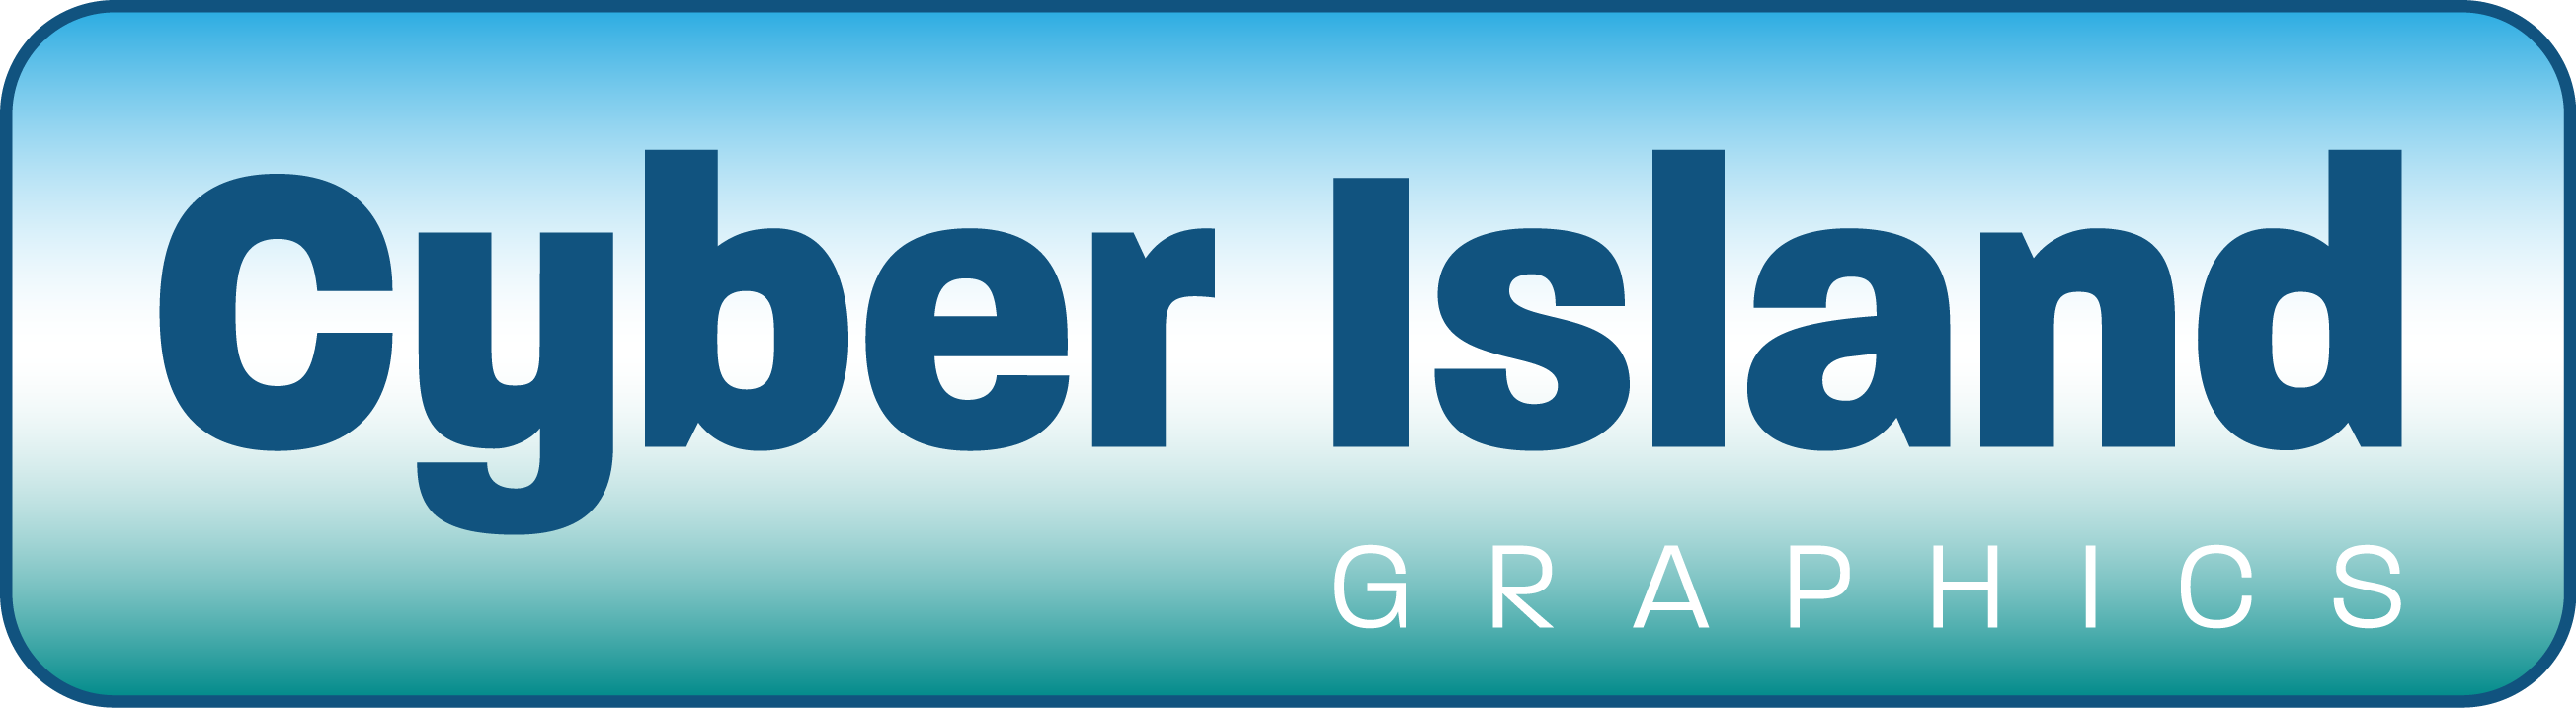 Cyber Island Graphics